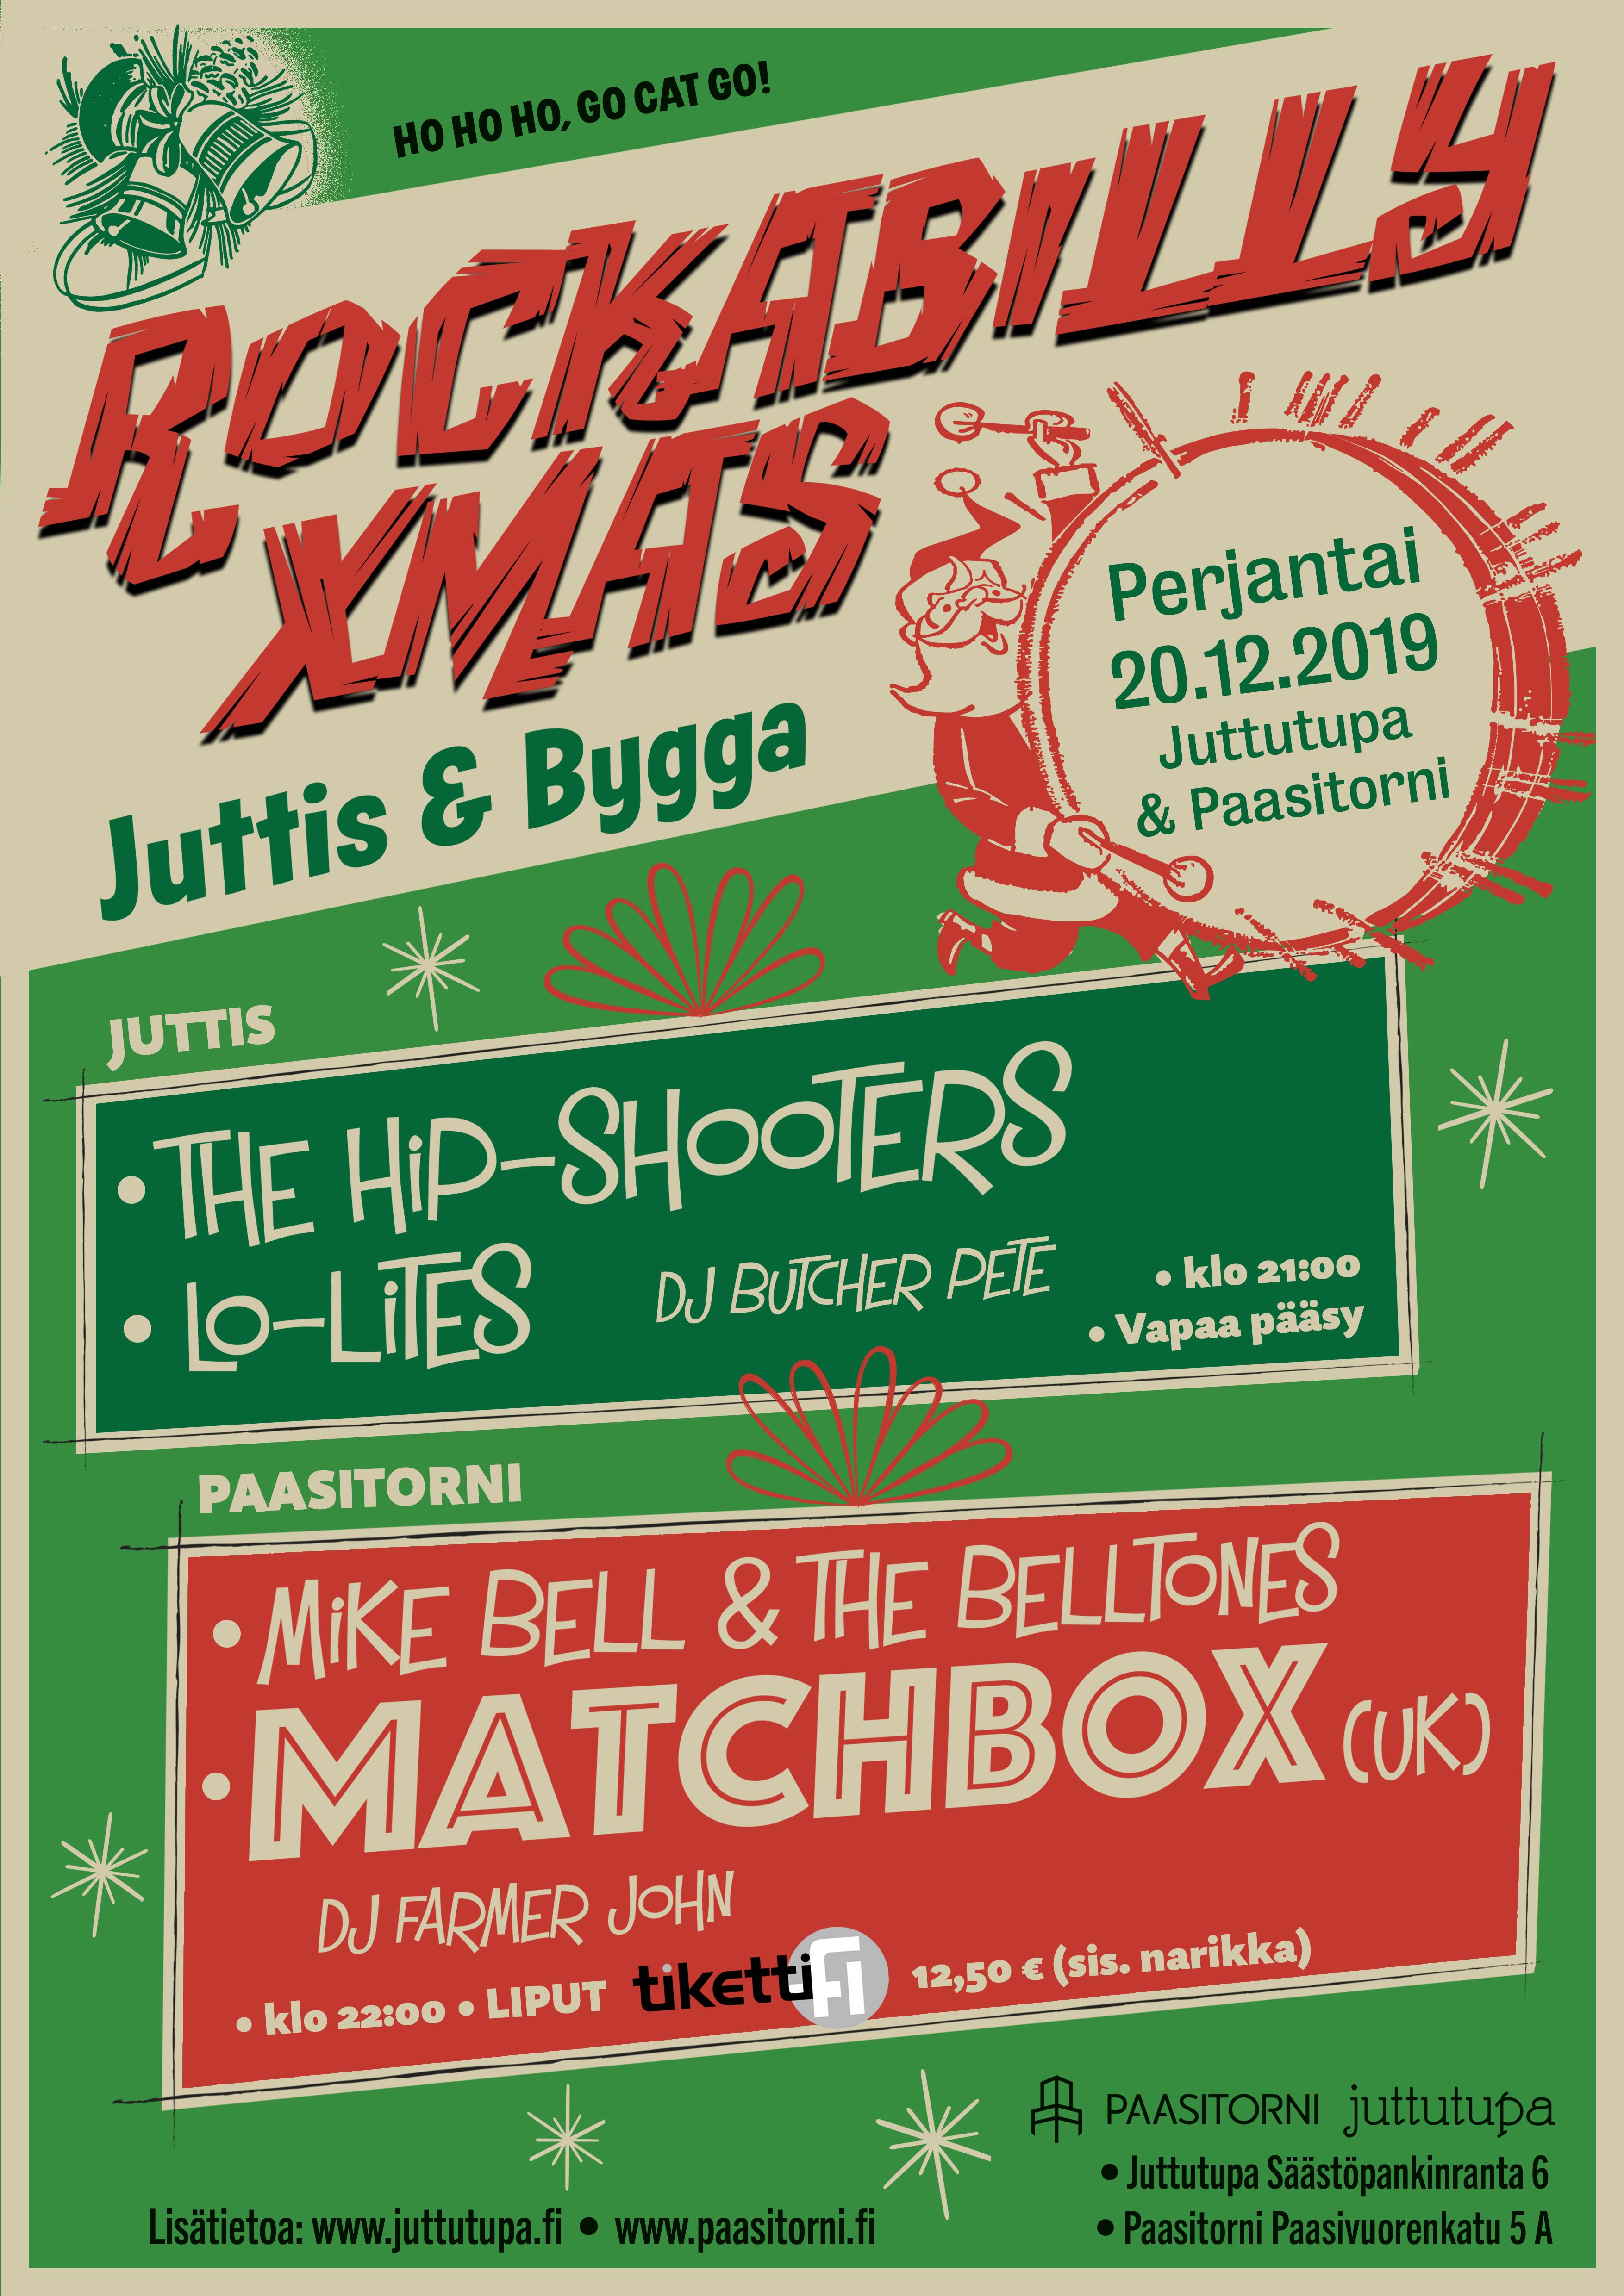 ROCKABILLY XMAS – Juttis & Bygga